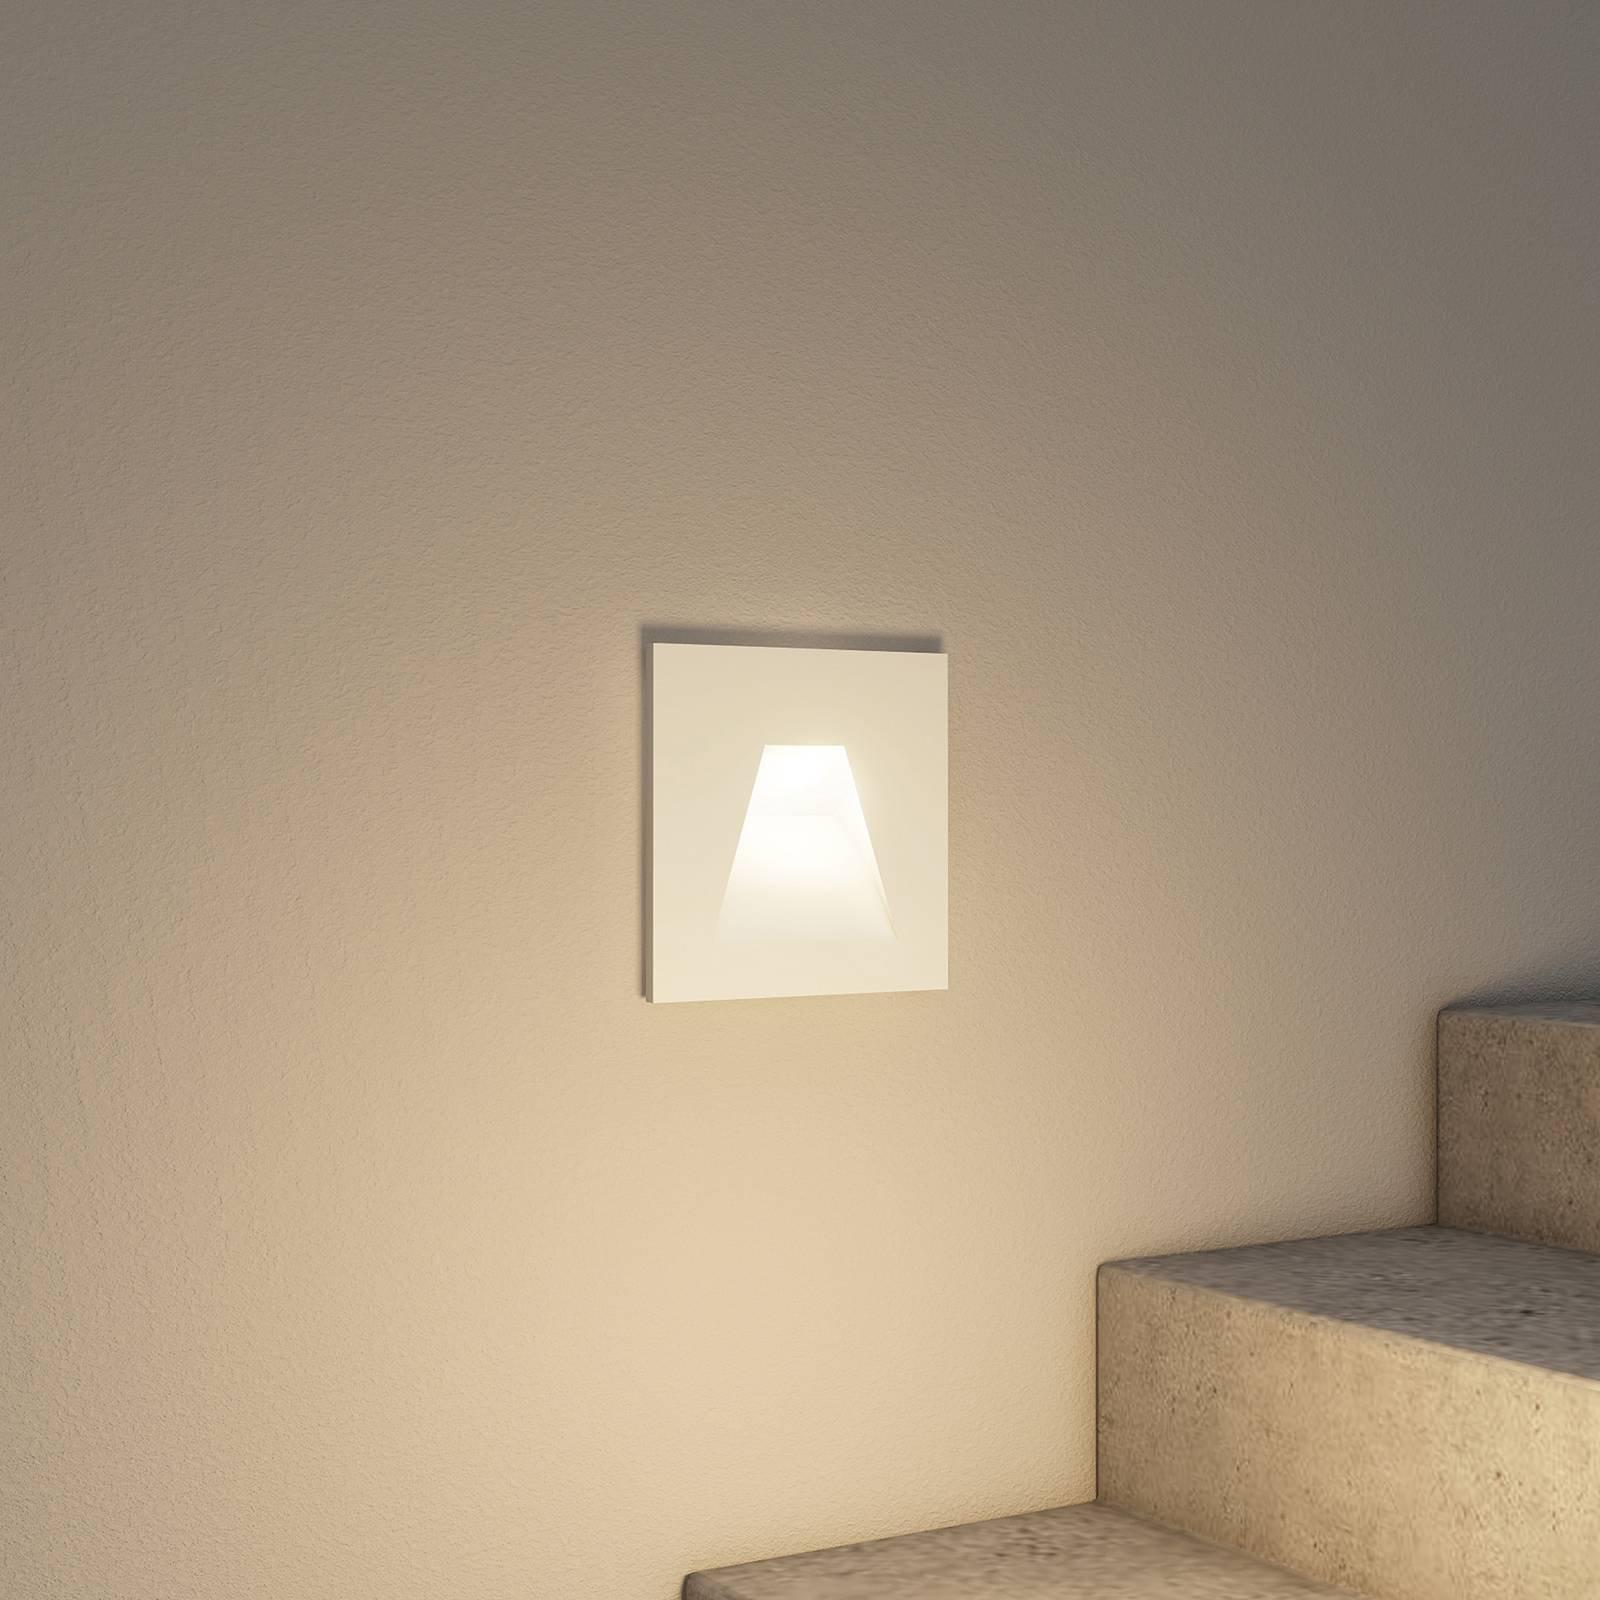 Arcchio Lasca LED-innfellingslampe, hvit